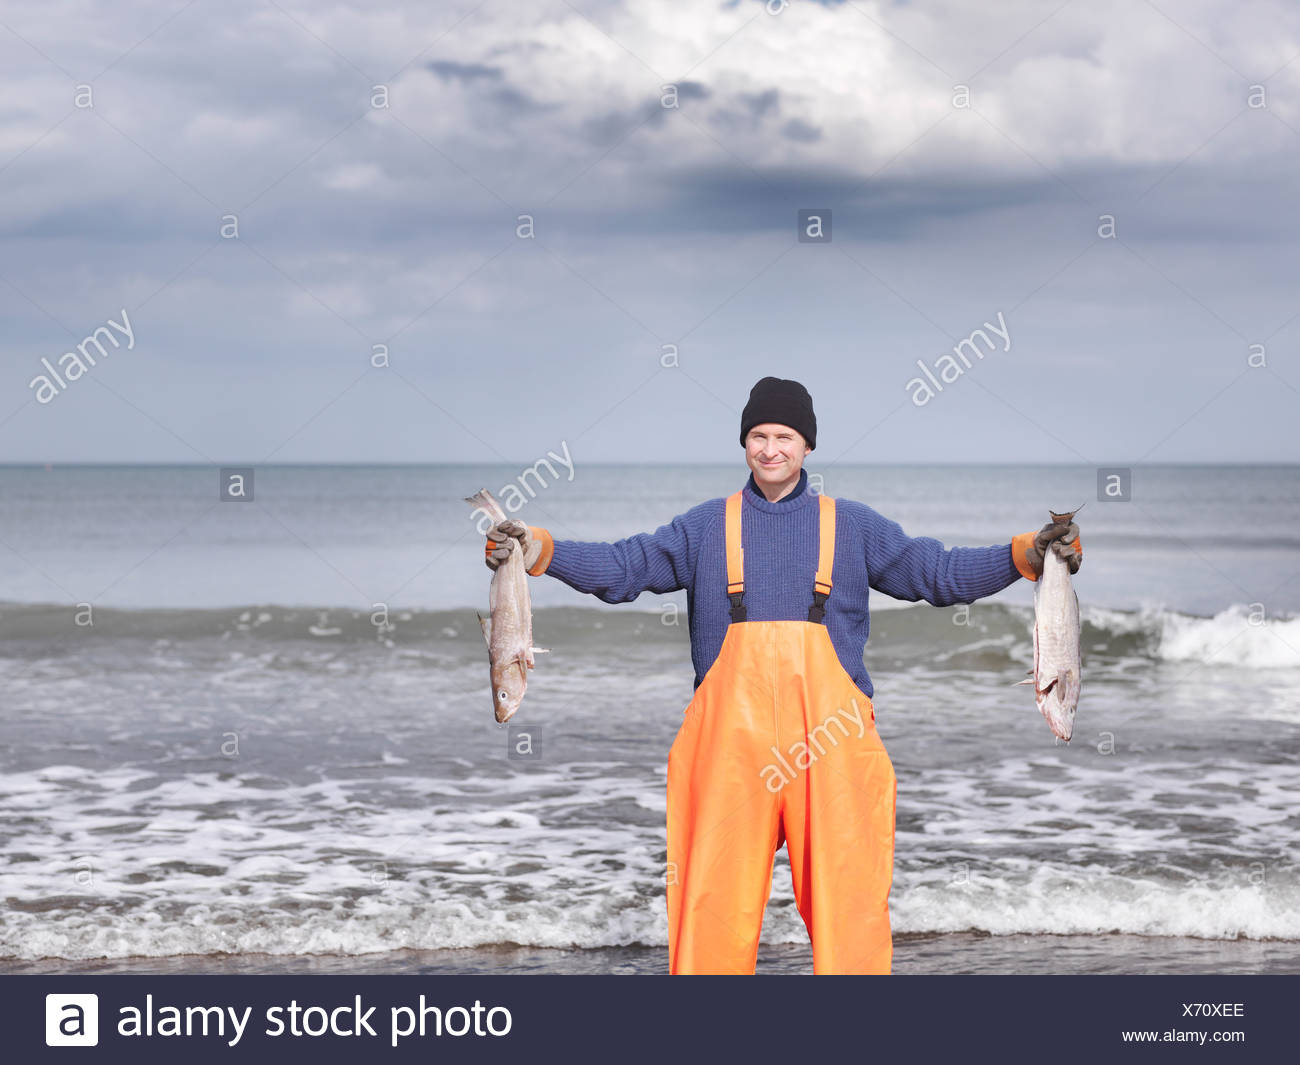 Fisherman on shore holding fish - Stock Image